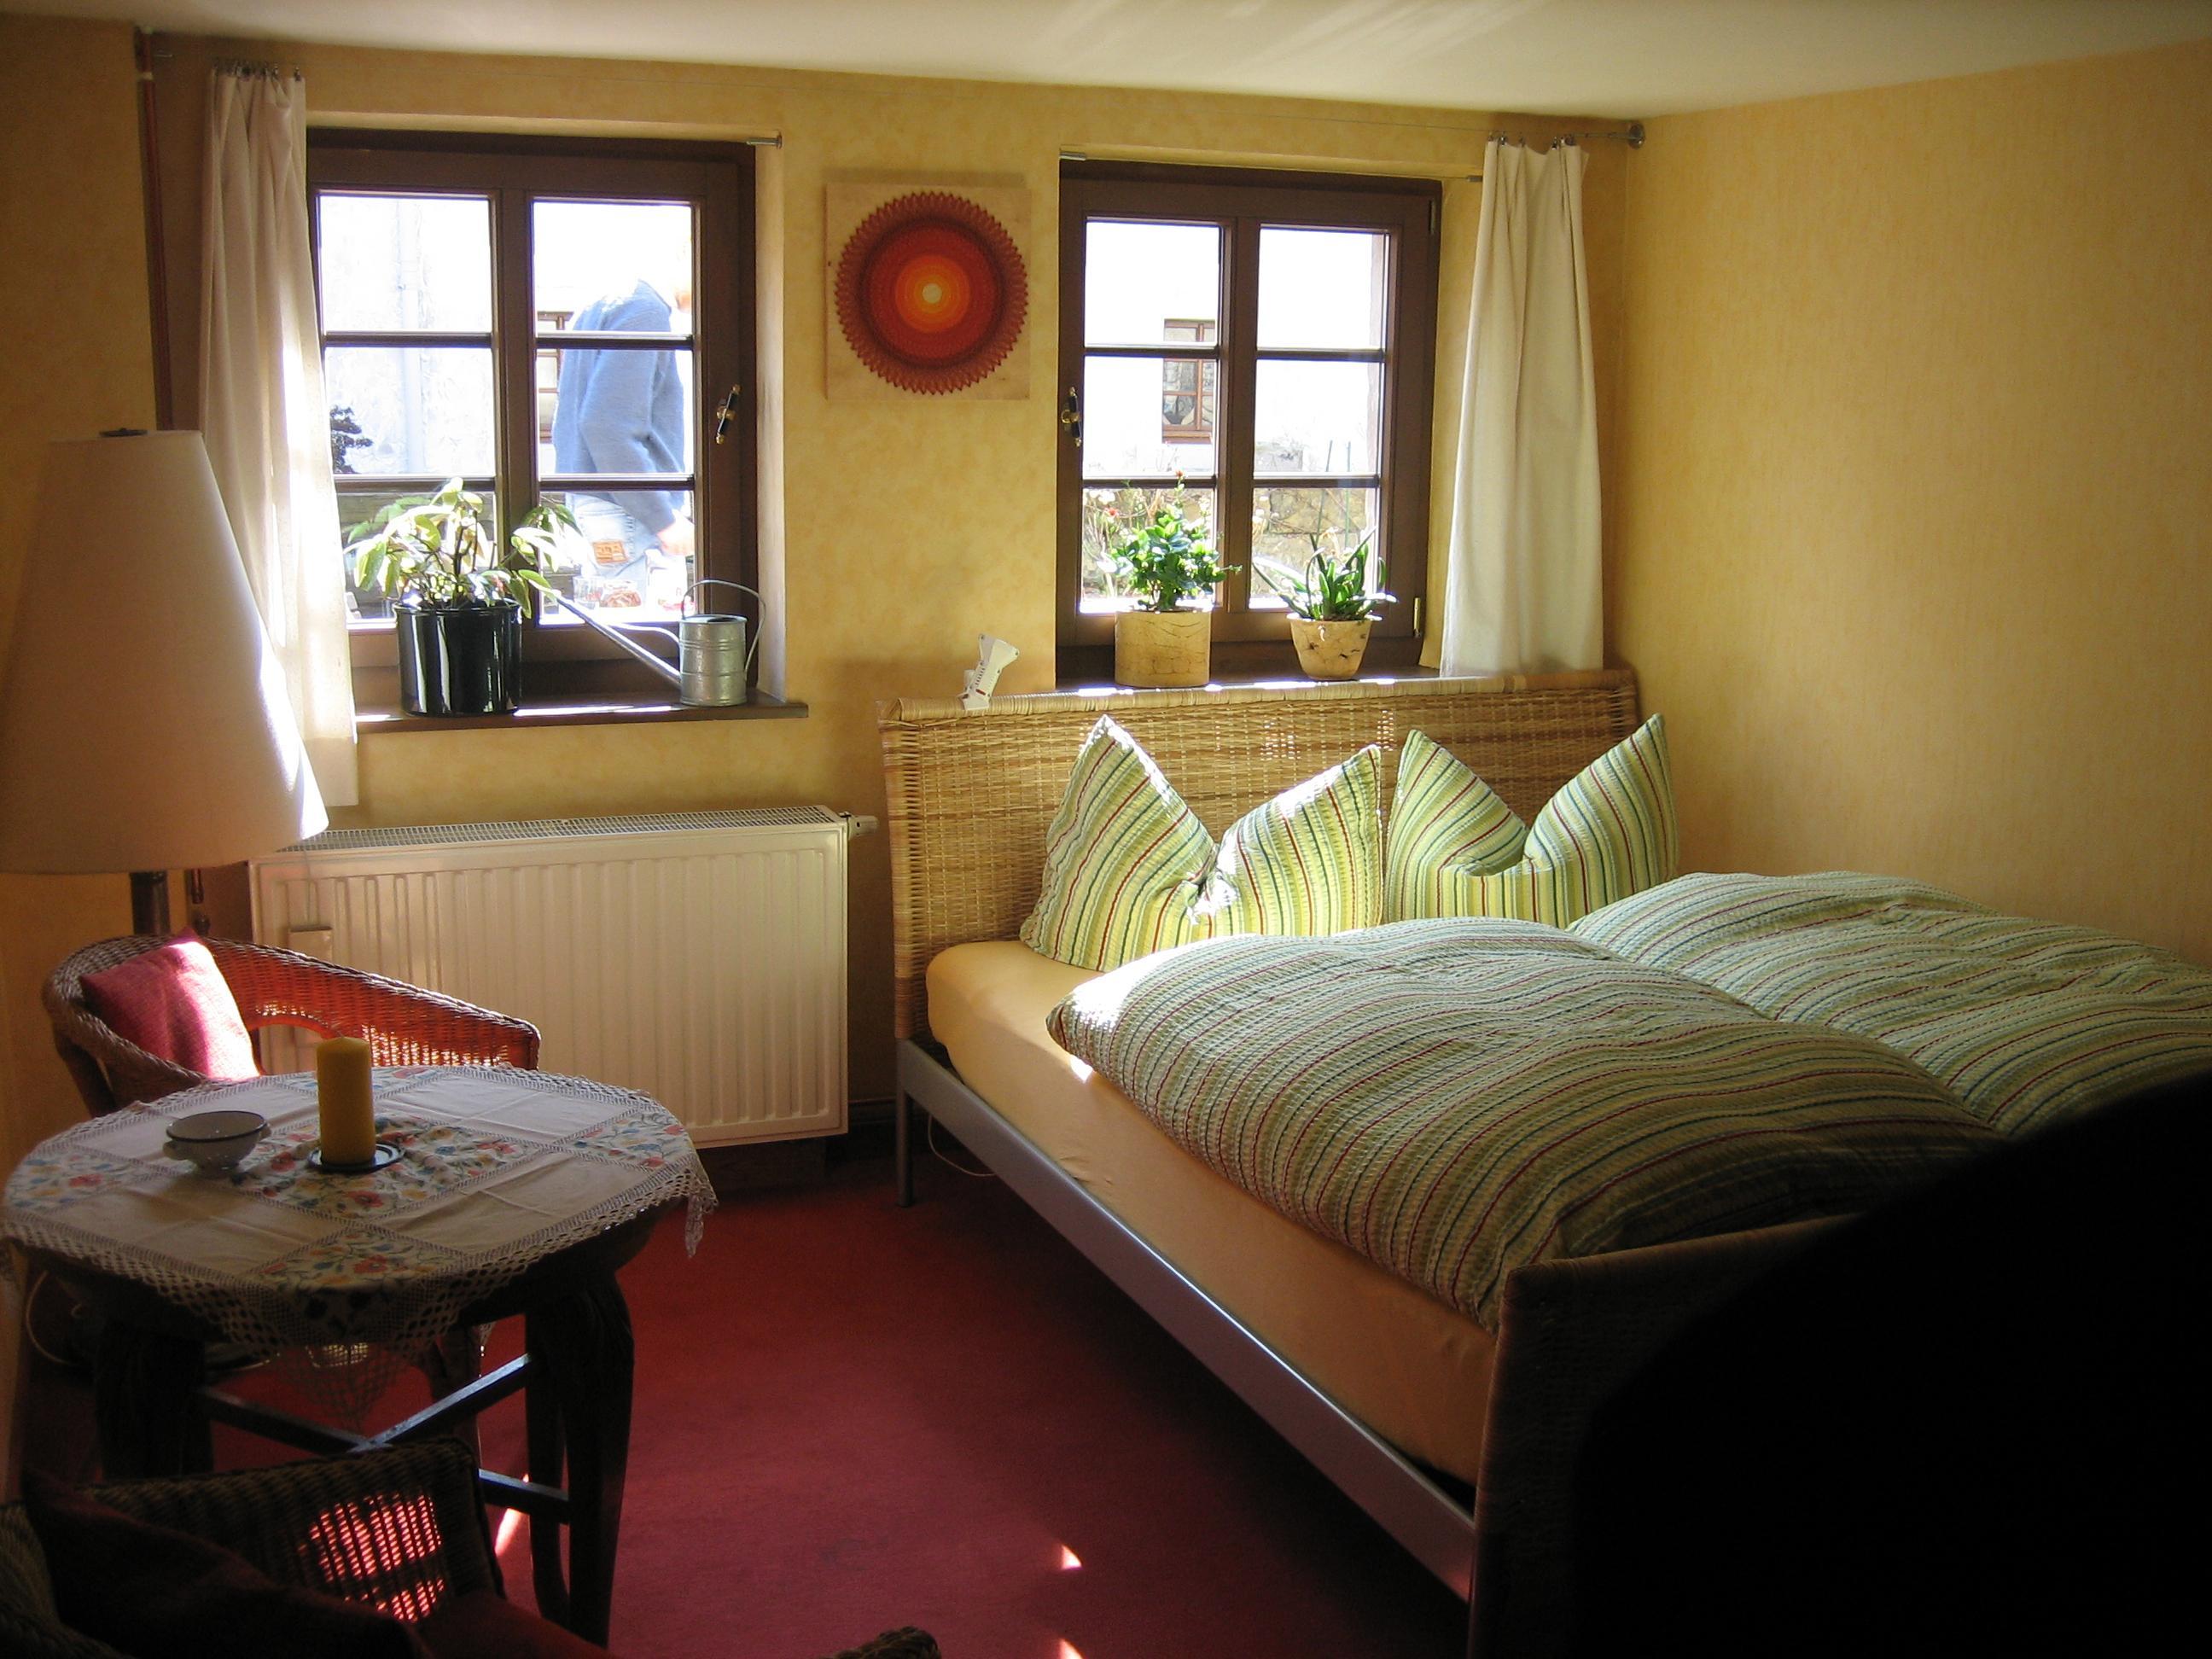 Wohnzimmer hell ausleuchten – dumss.com